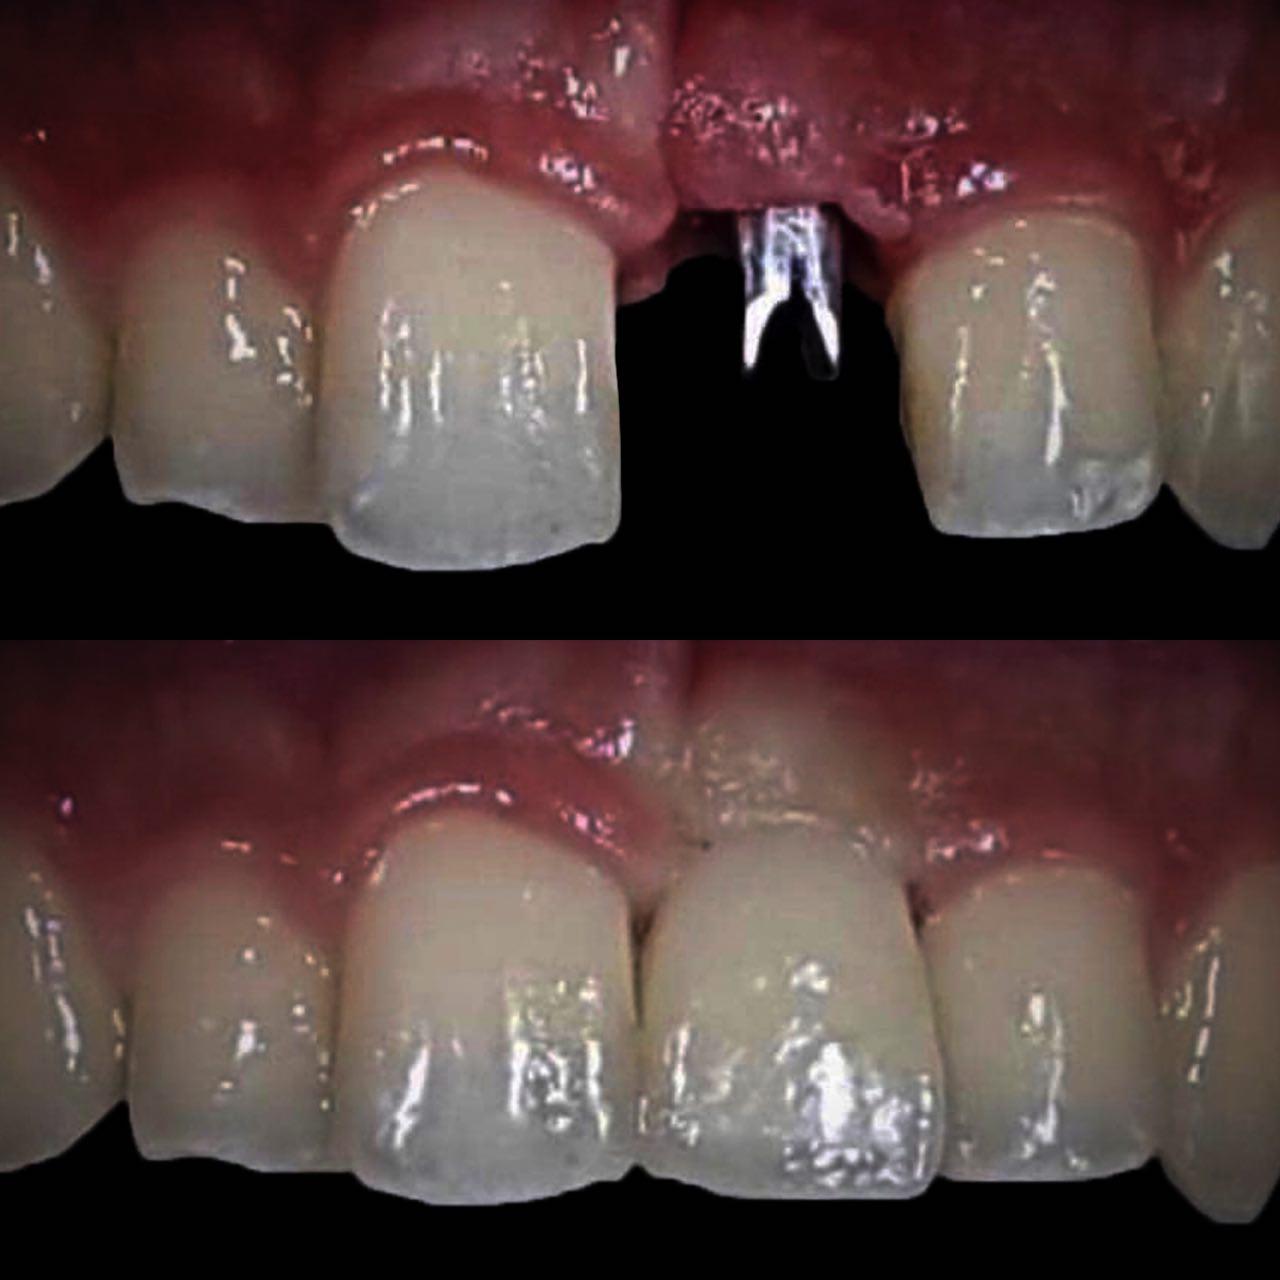 IMG A63EBE23BD66 2 - Імплантація зубів